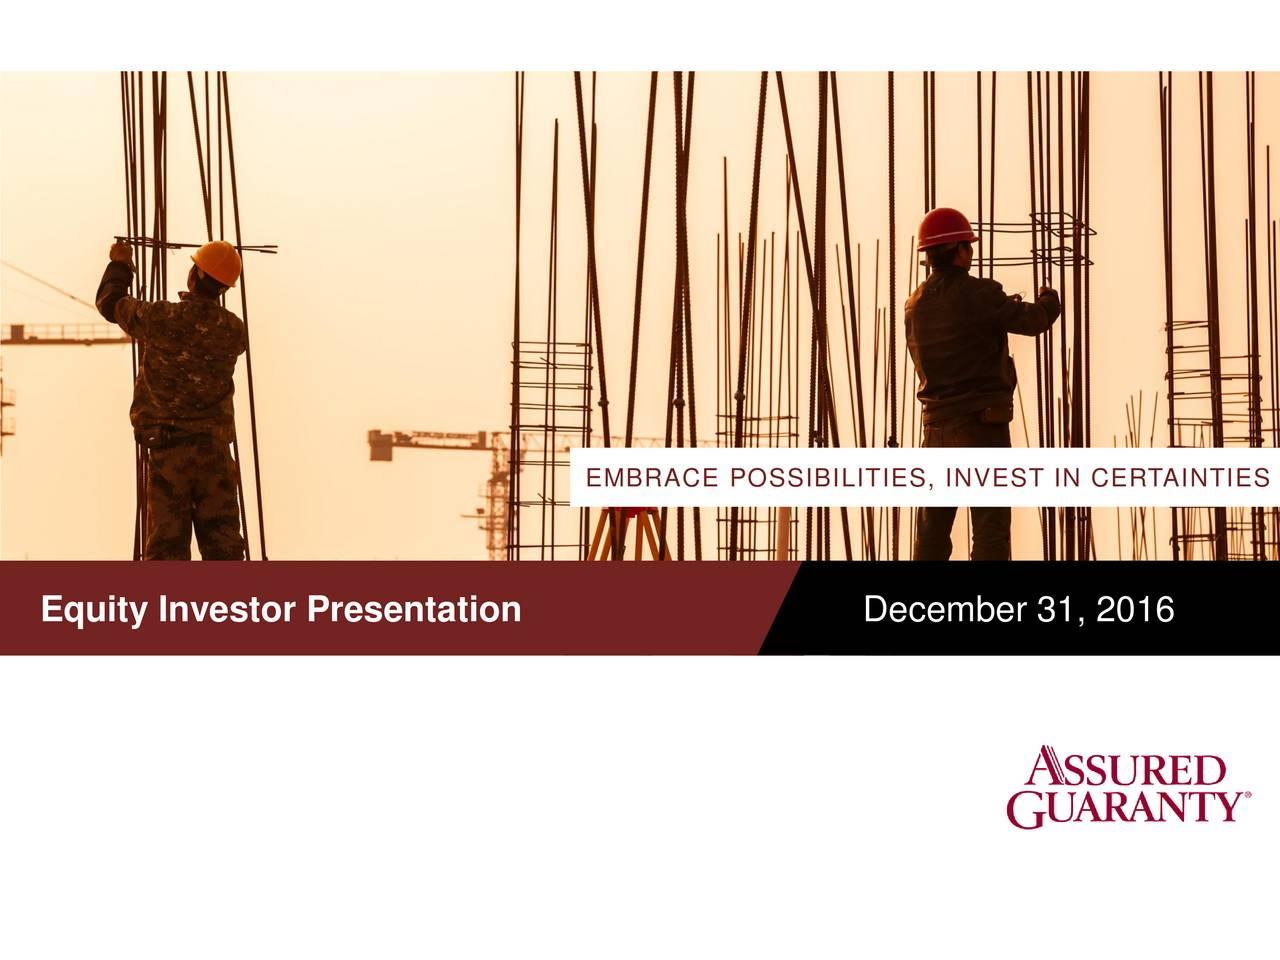 Equity Investor Presentation December 31, 2016